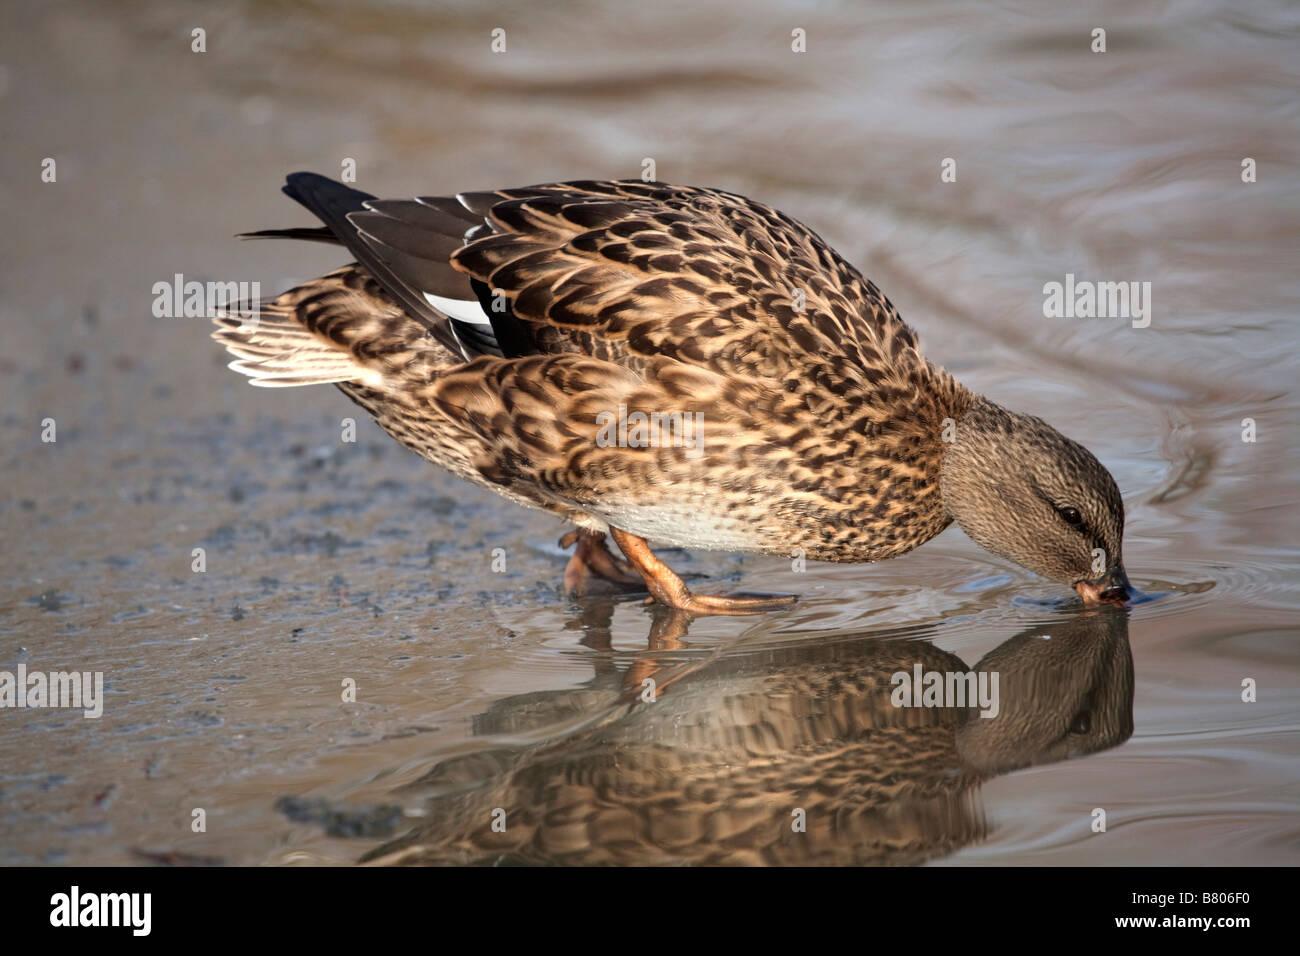 gadwall Anas strepera at water - Stock Image